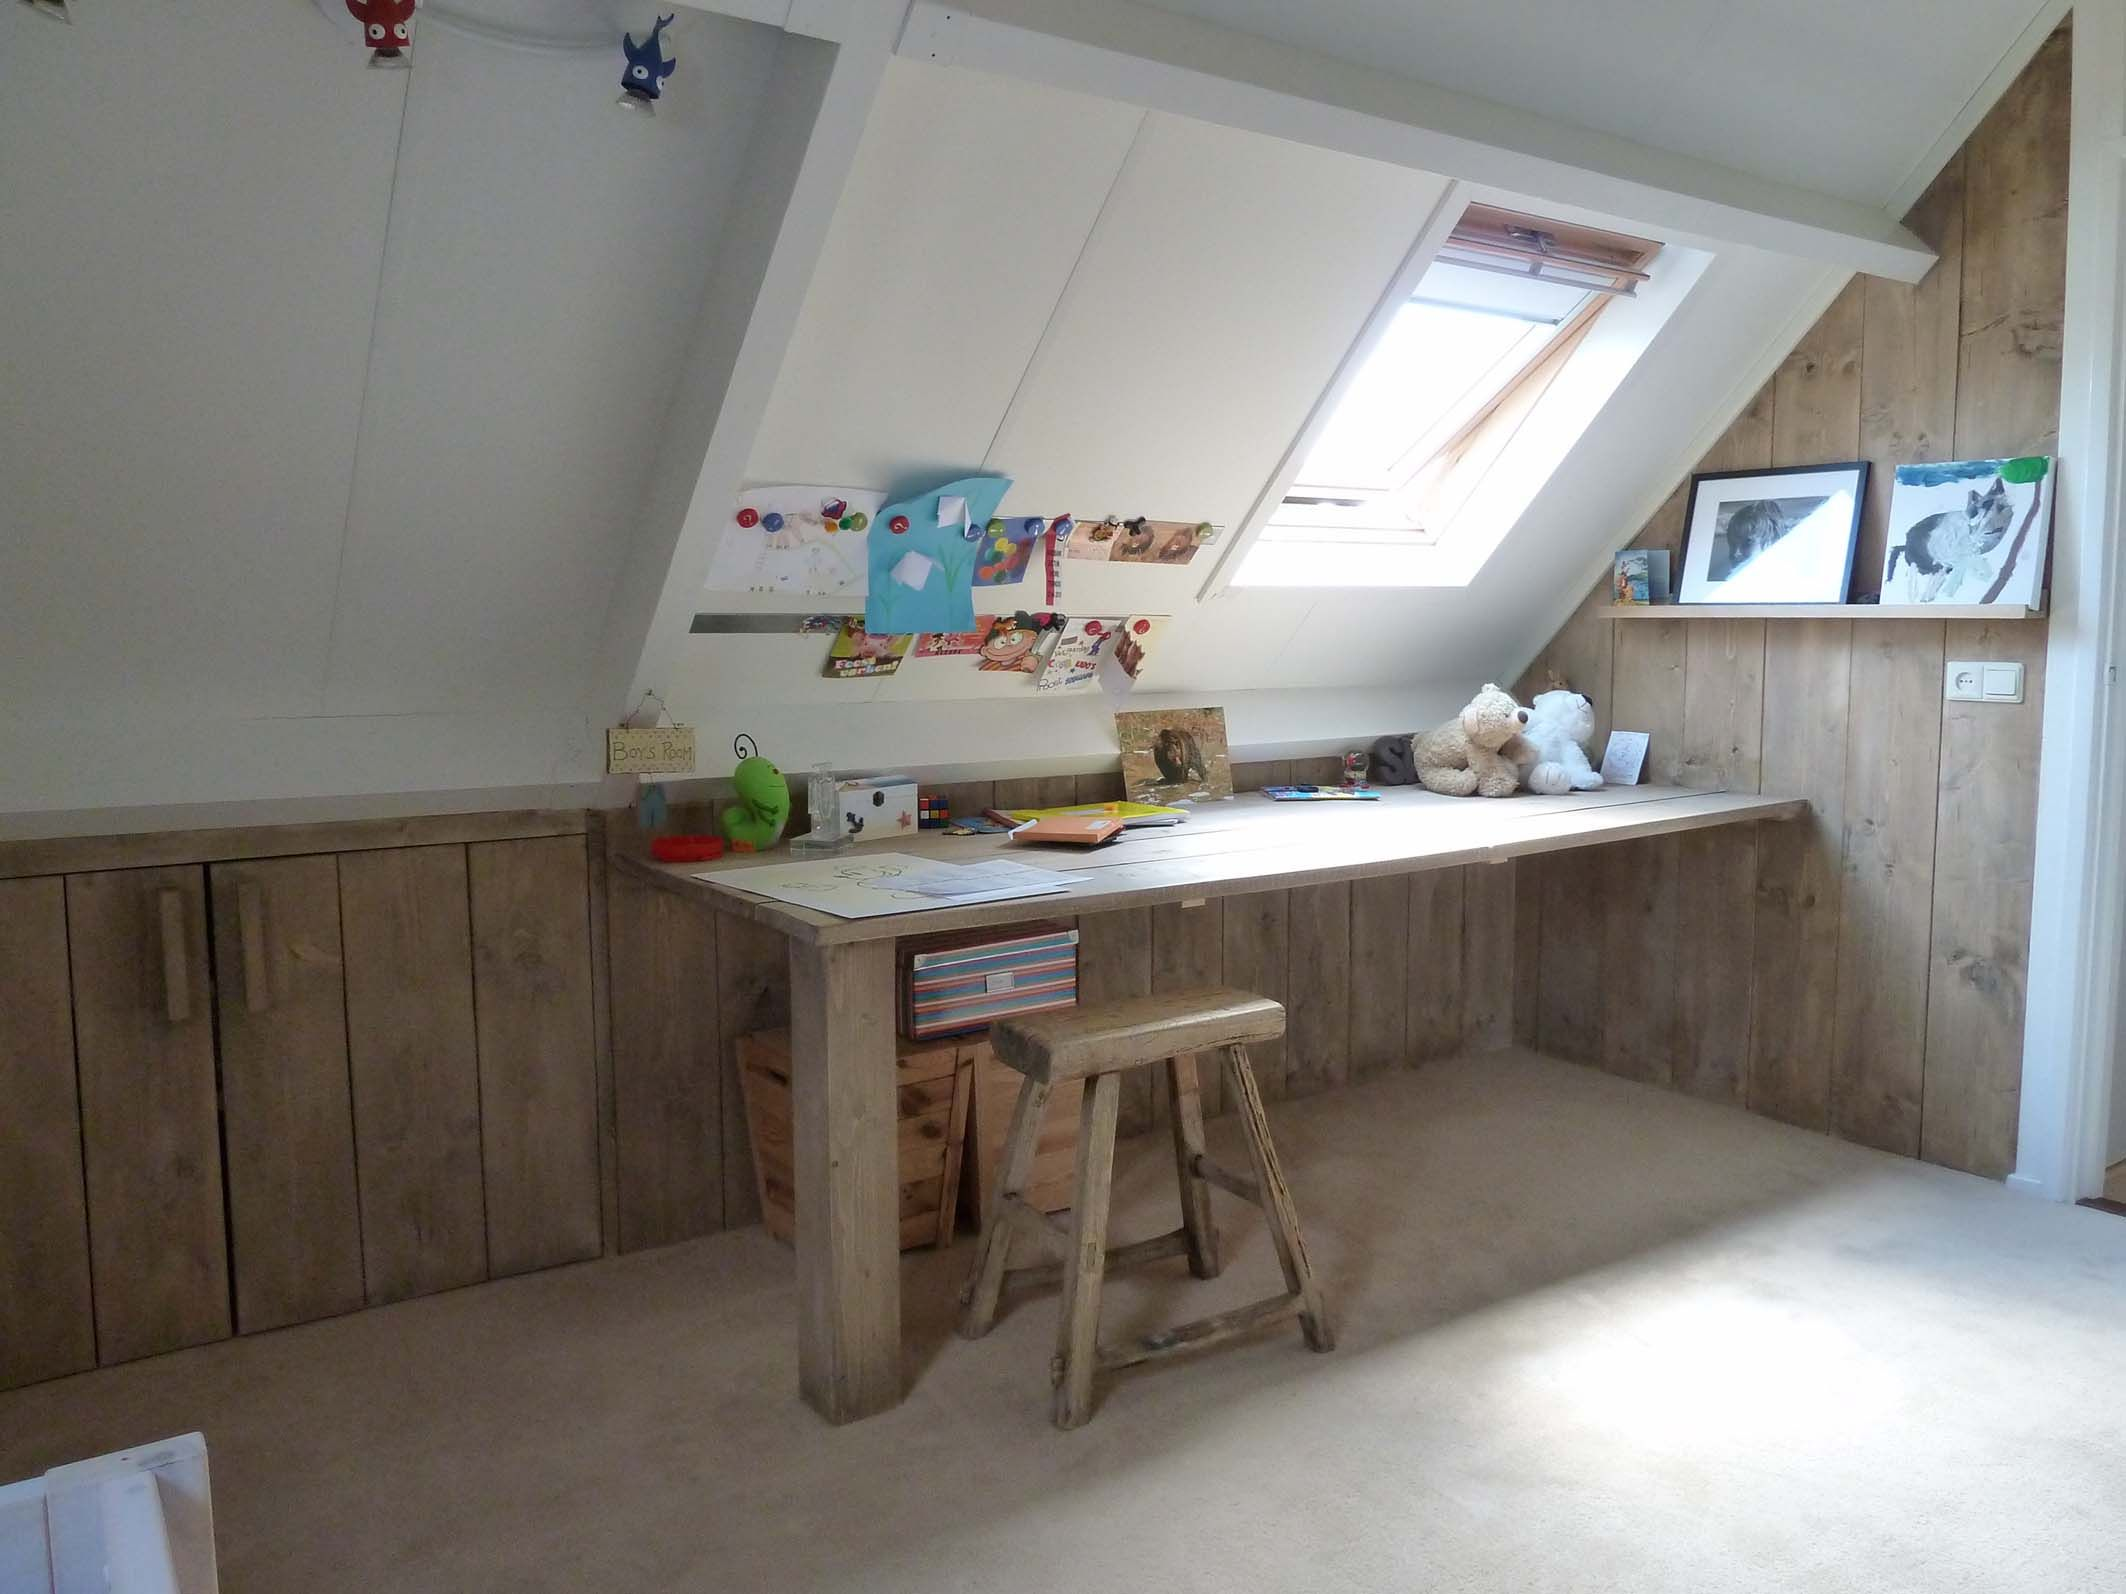 Bureau kinderkamer steigerhout jasiena slaapkamer pinterest bureaus kinderkamer en zolder - Kind mezzanine kantoor ...